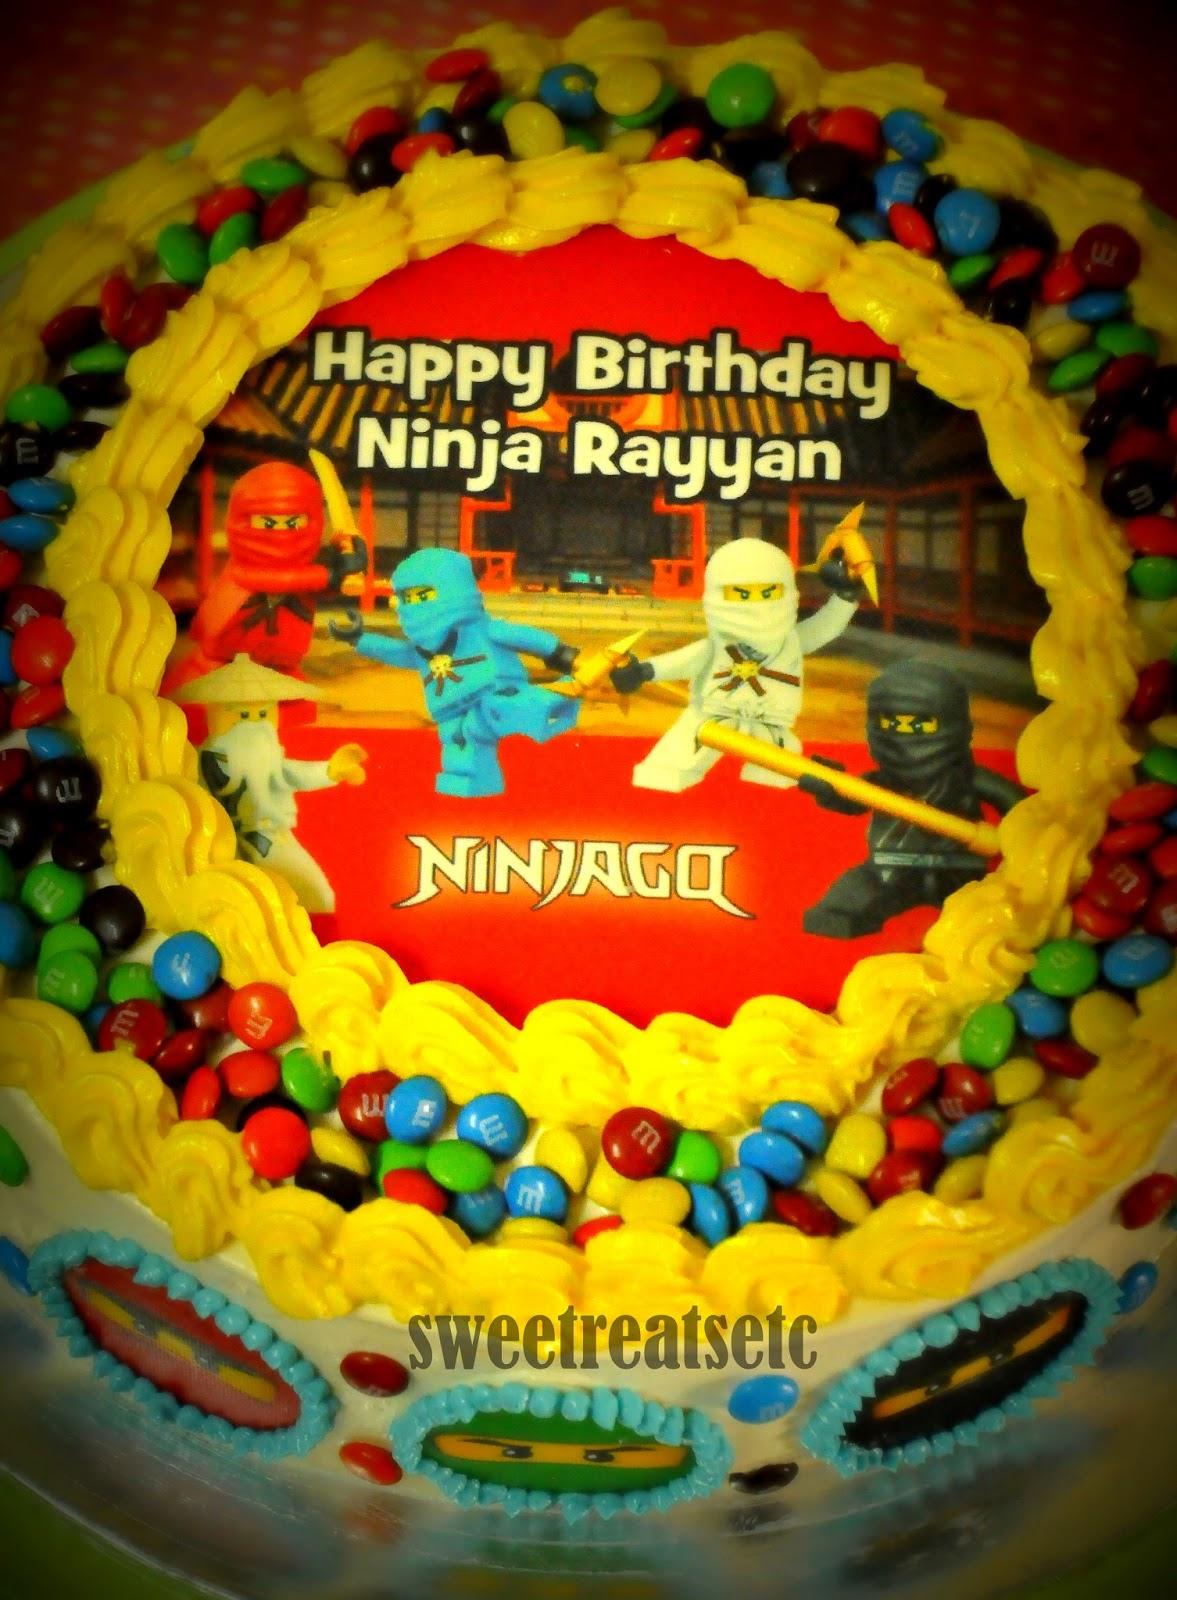 Sweetreats Etcetera Ninjago Theme Birthday Cake